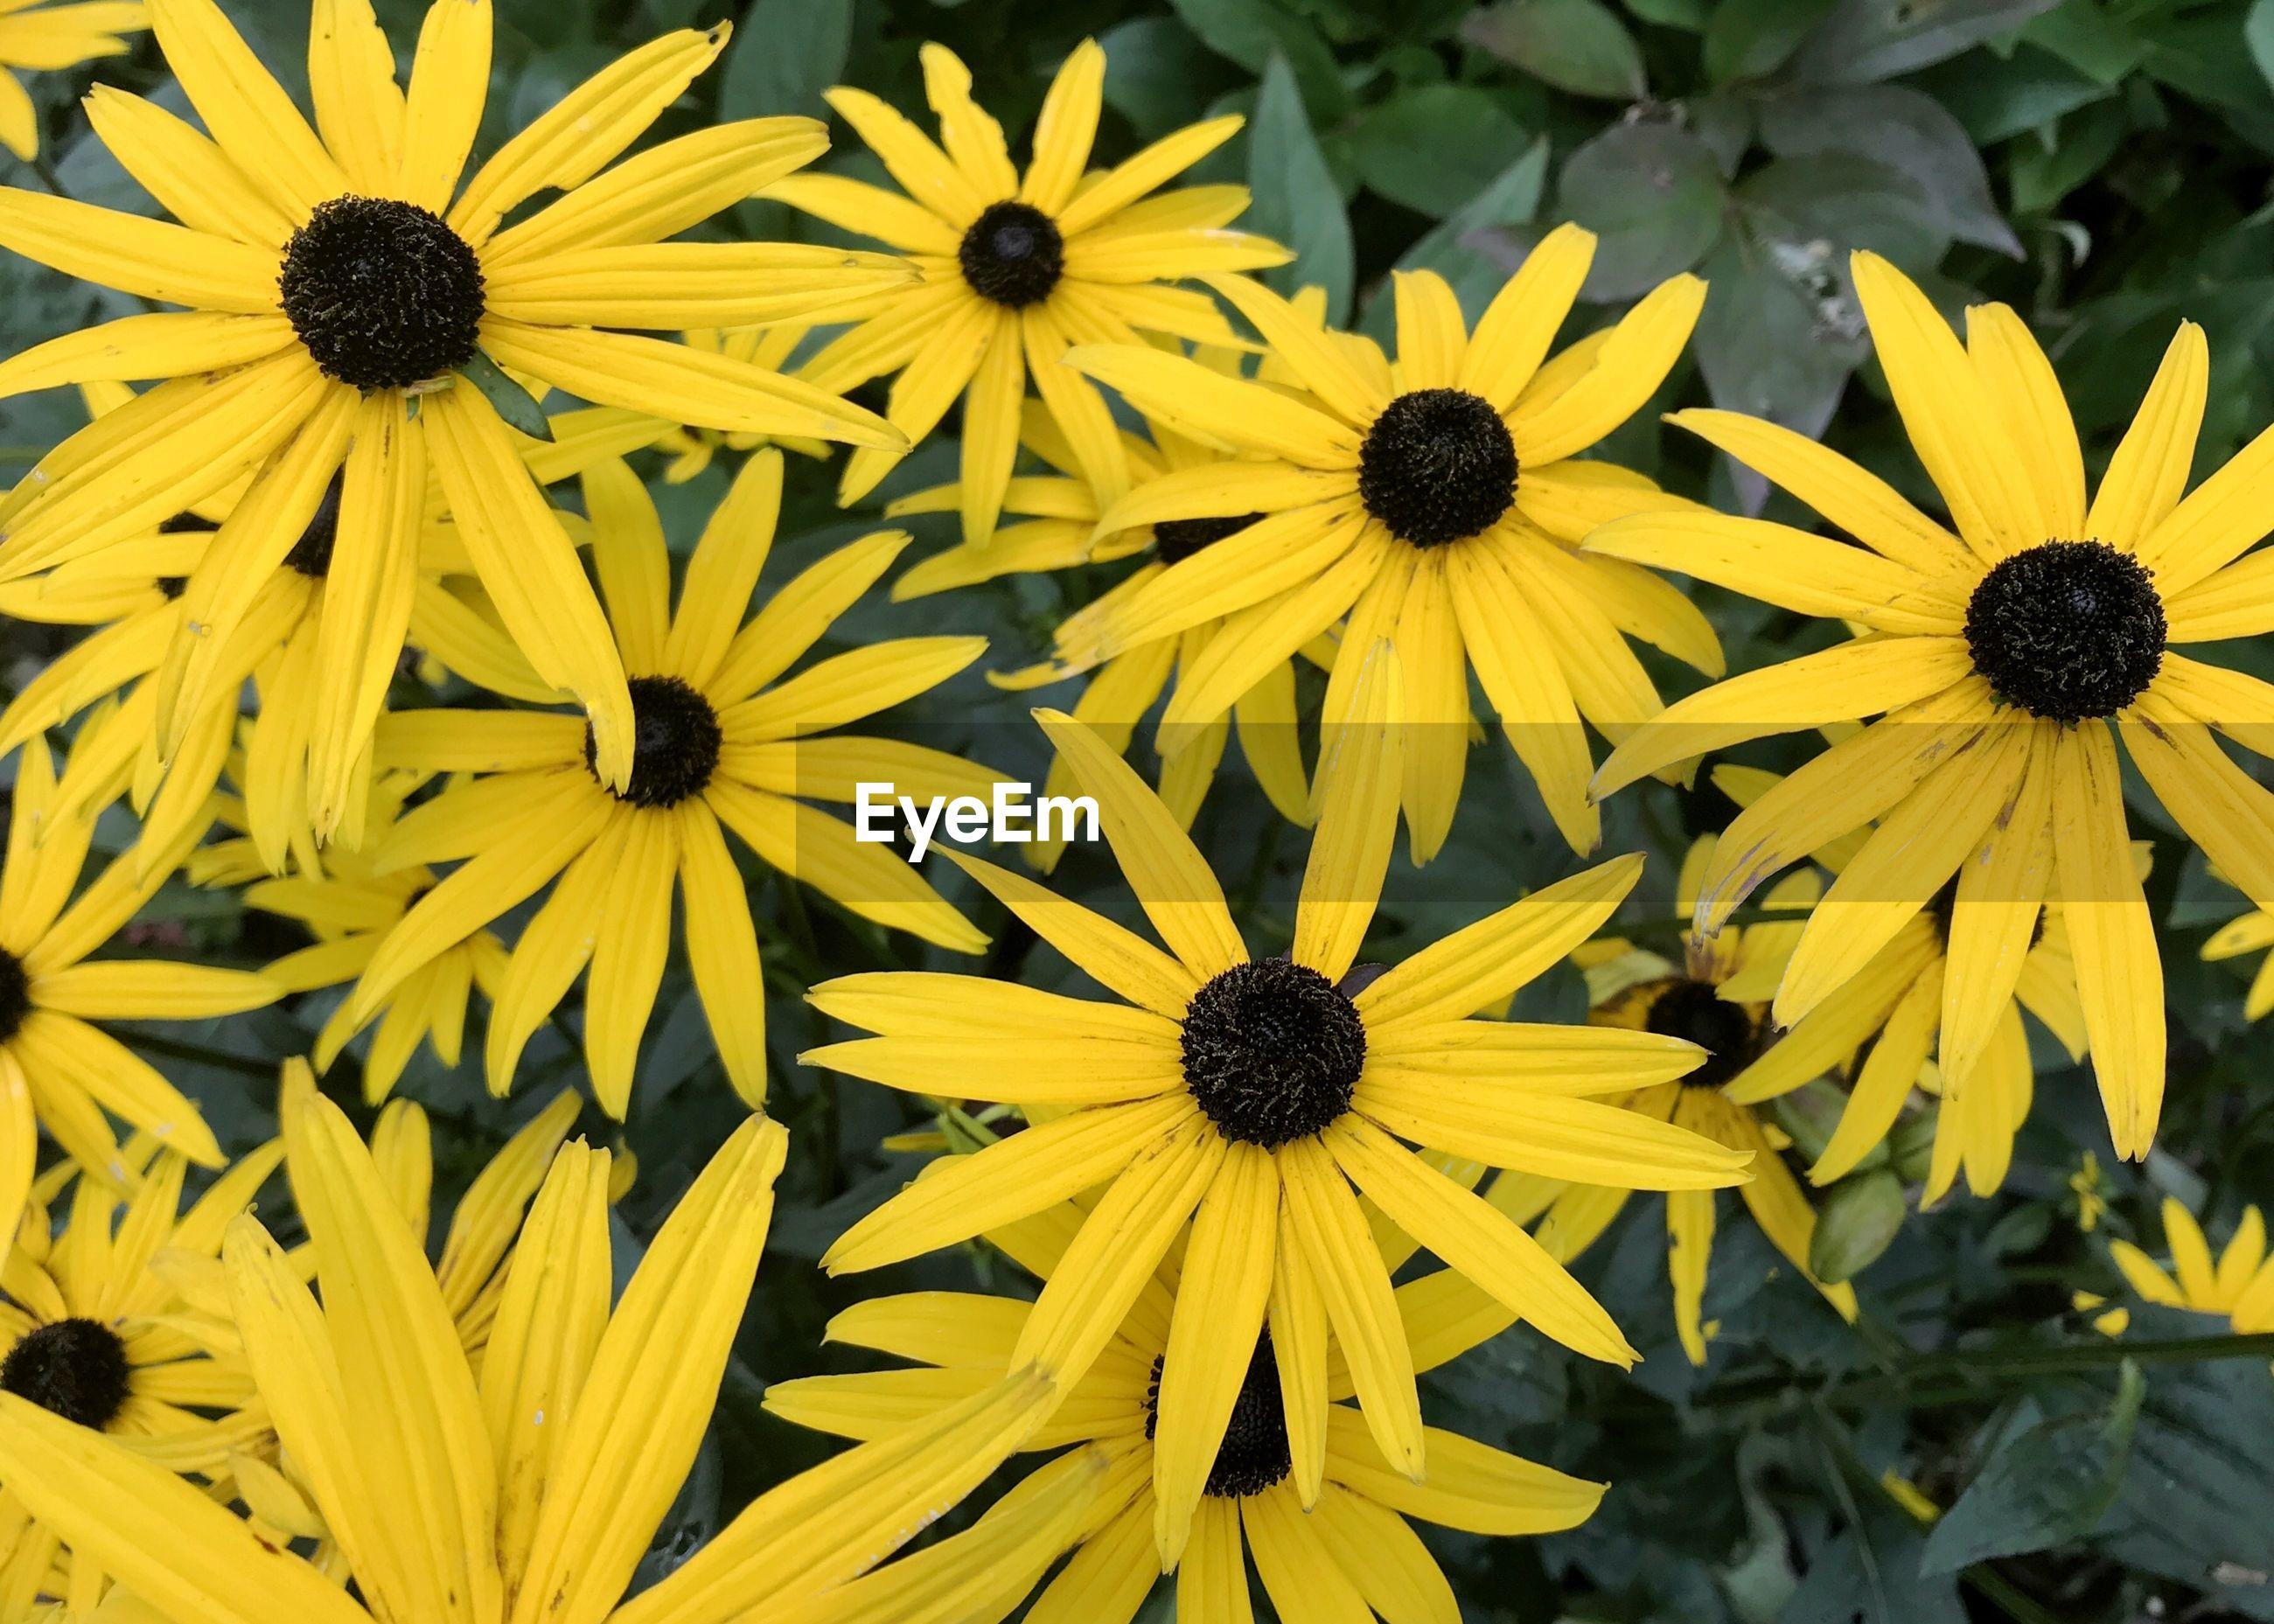 FULL FRAME SHOT OF YELLOW BLACK-EYED AND PURPLE DAISY